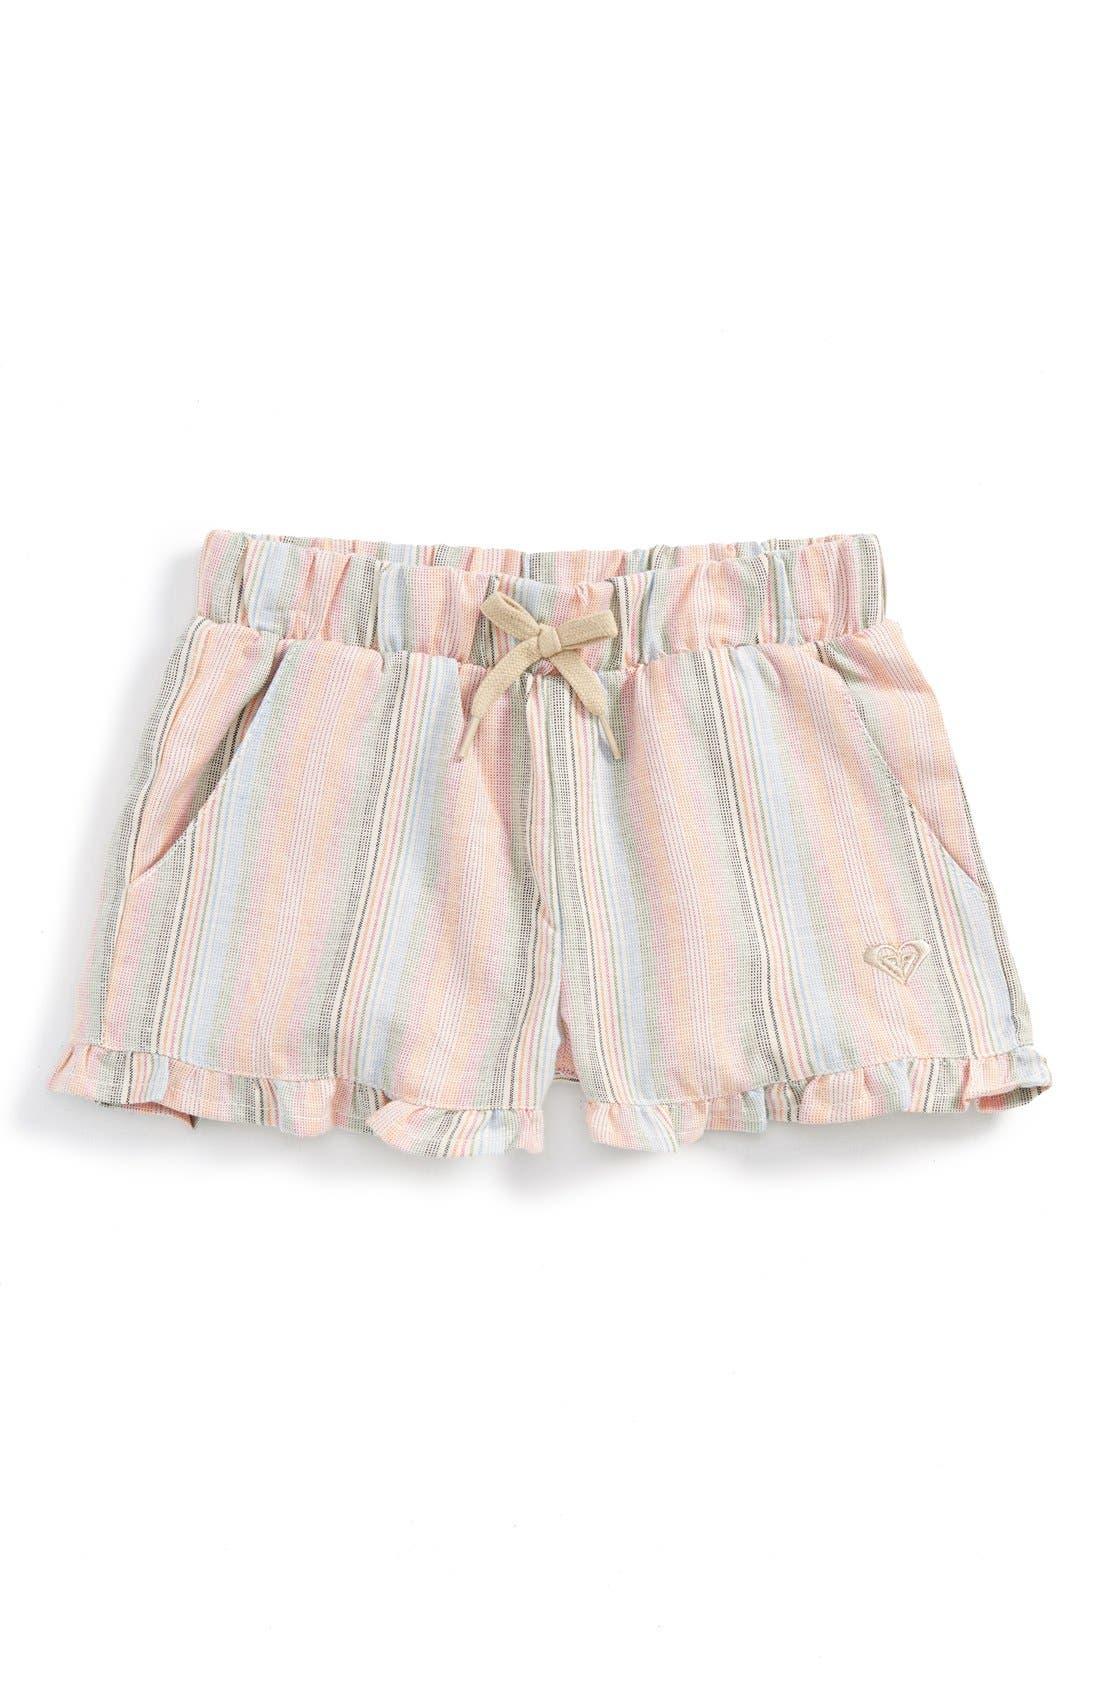 Alternate Image 1 Selected - Roxy 'Ruffled Feathers' Stripe Shorts (Baby Girls)